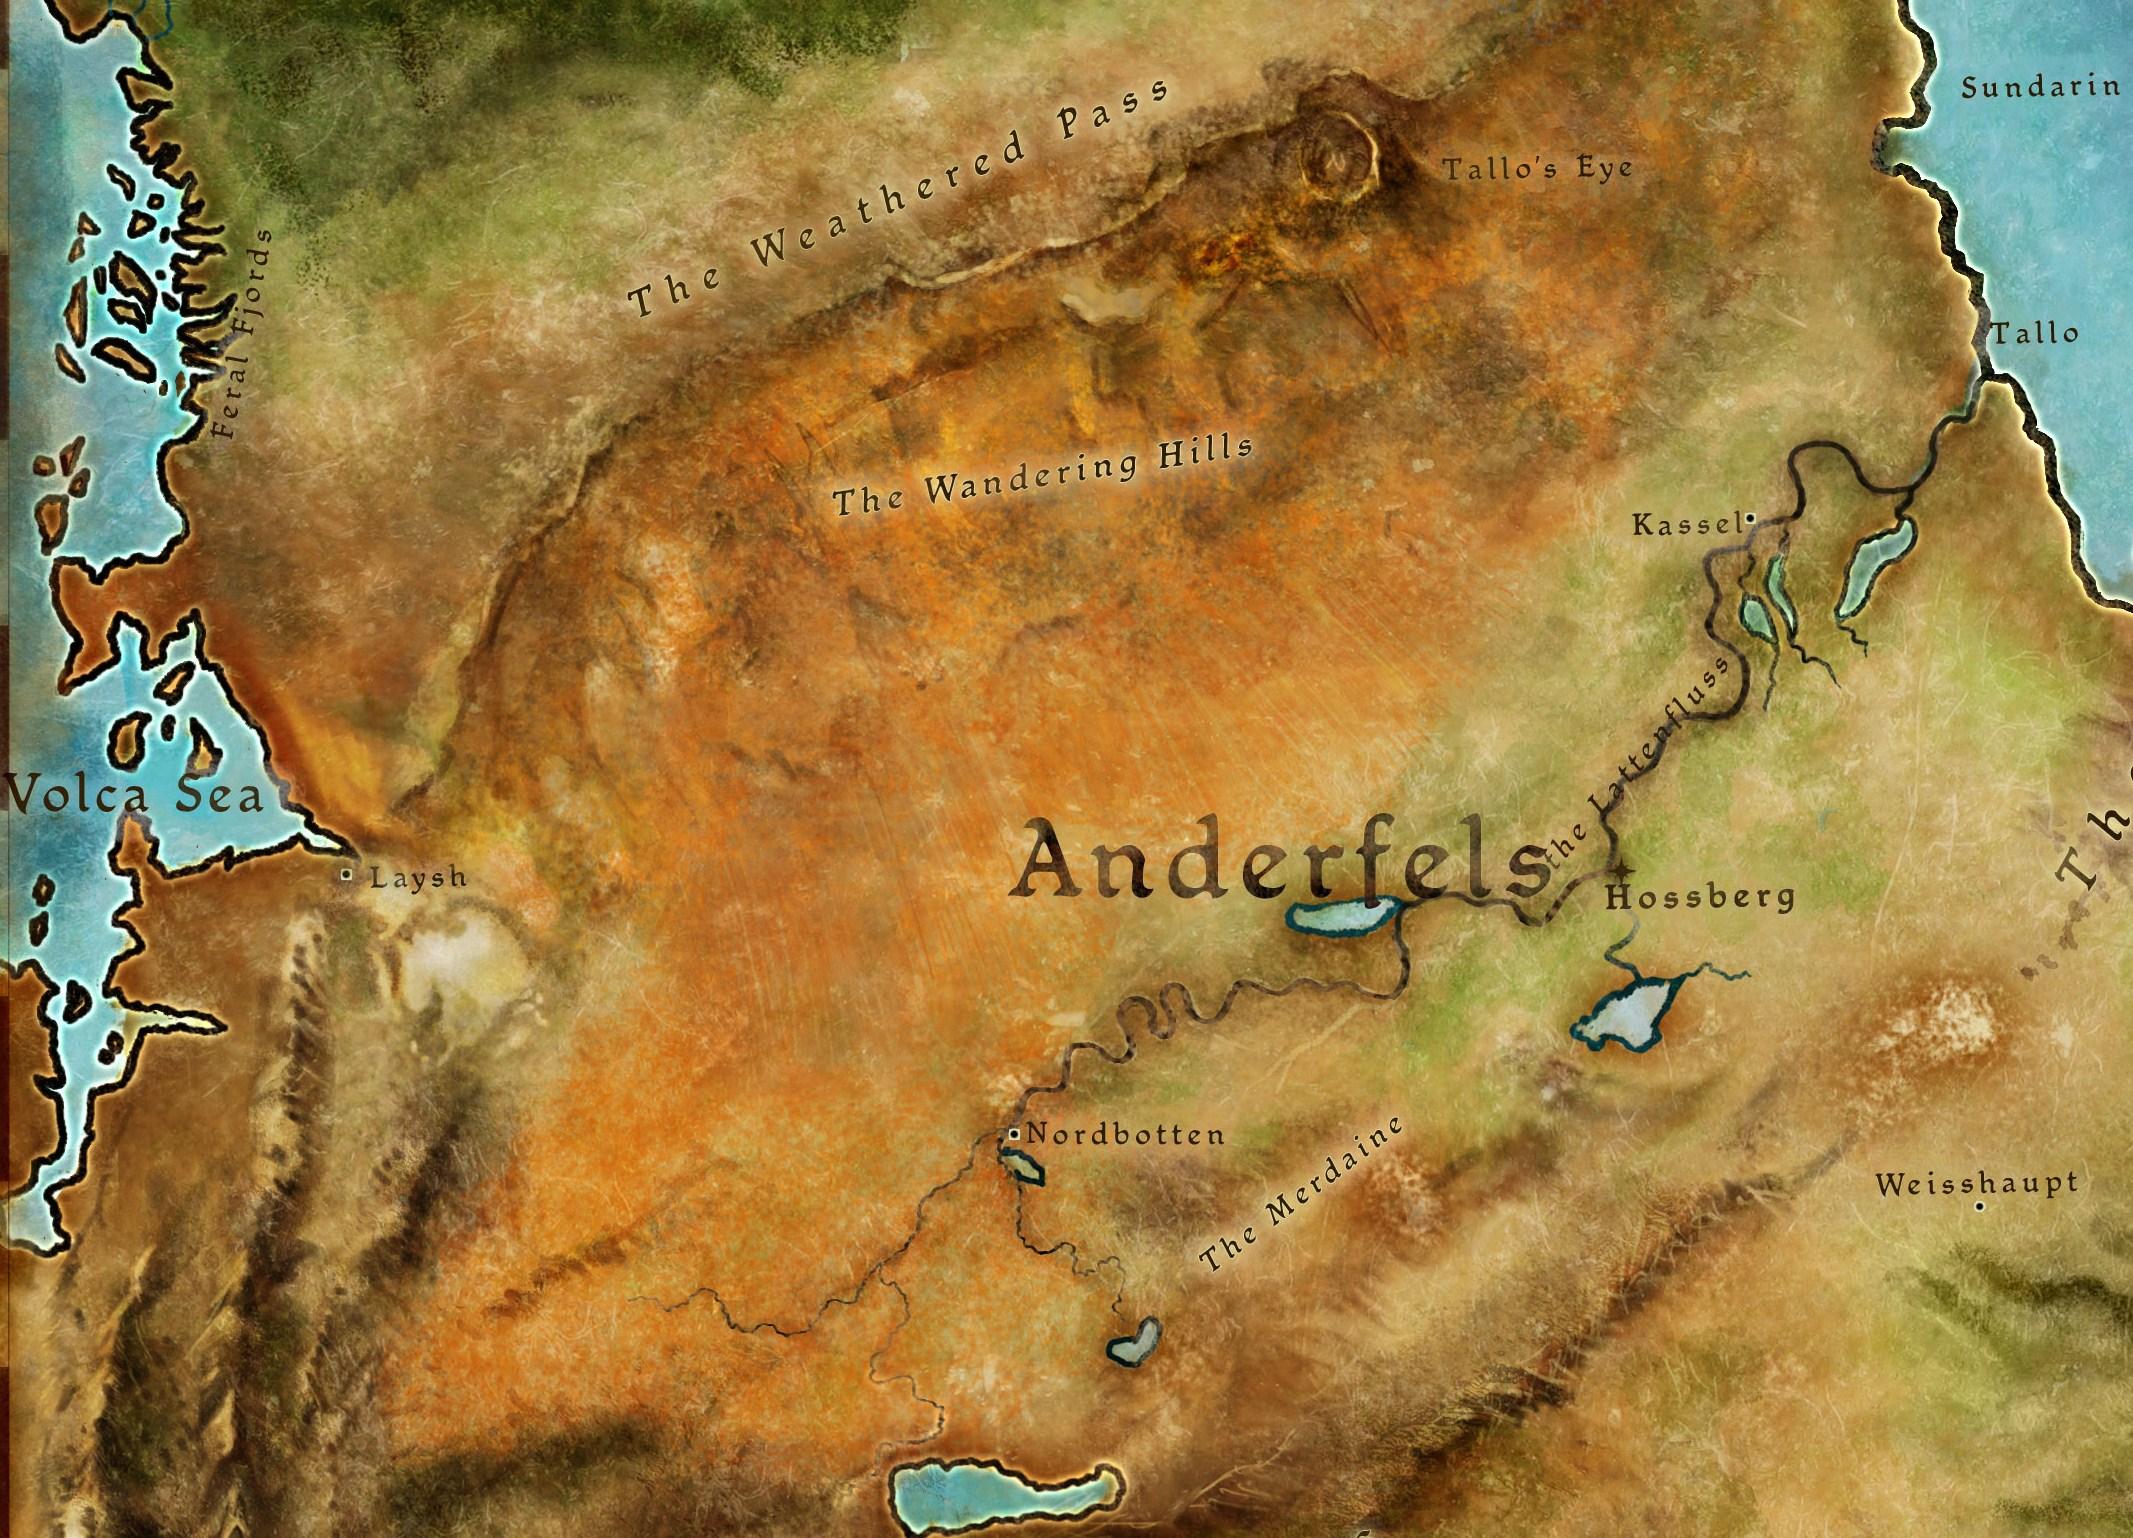 Archivo:Anderfels.jpg